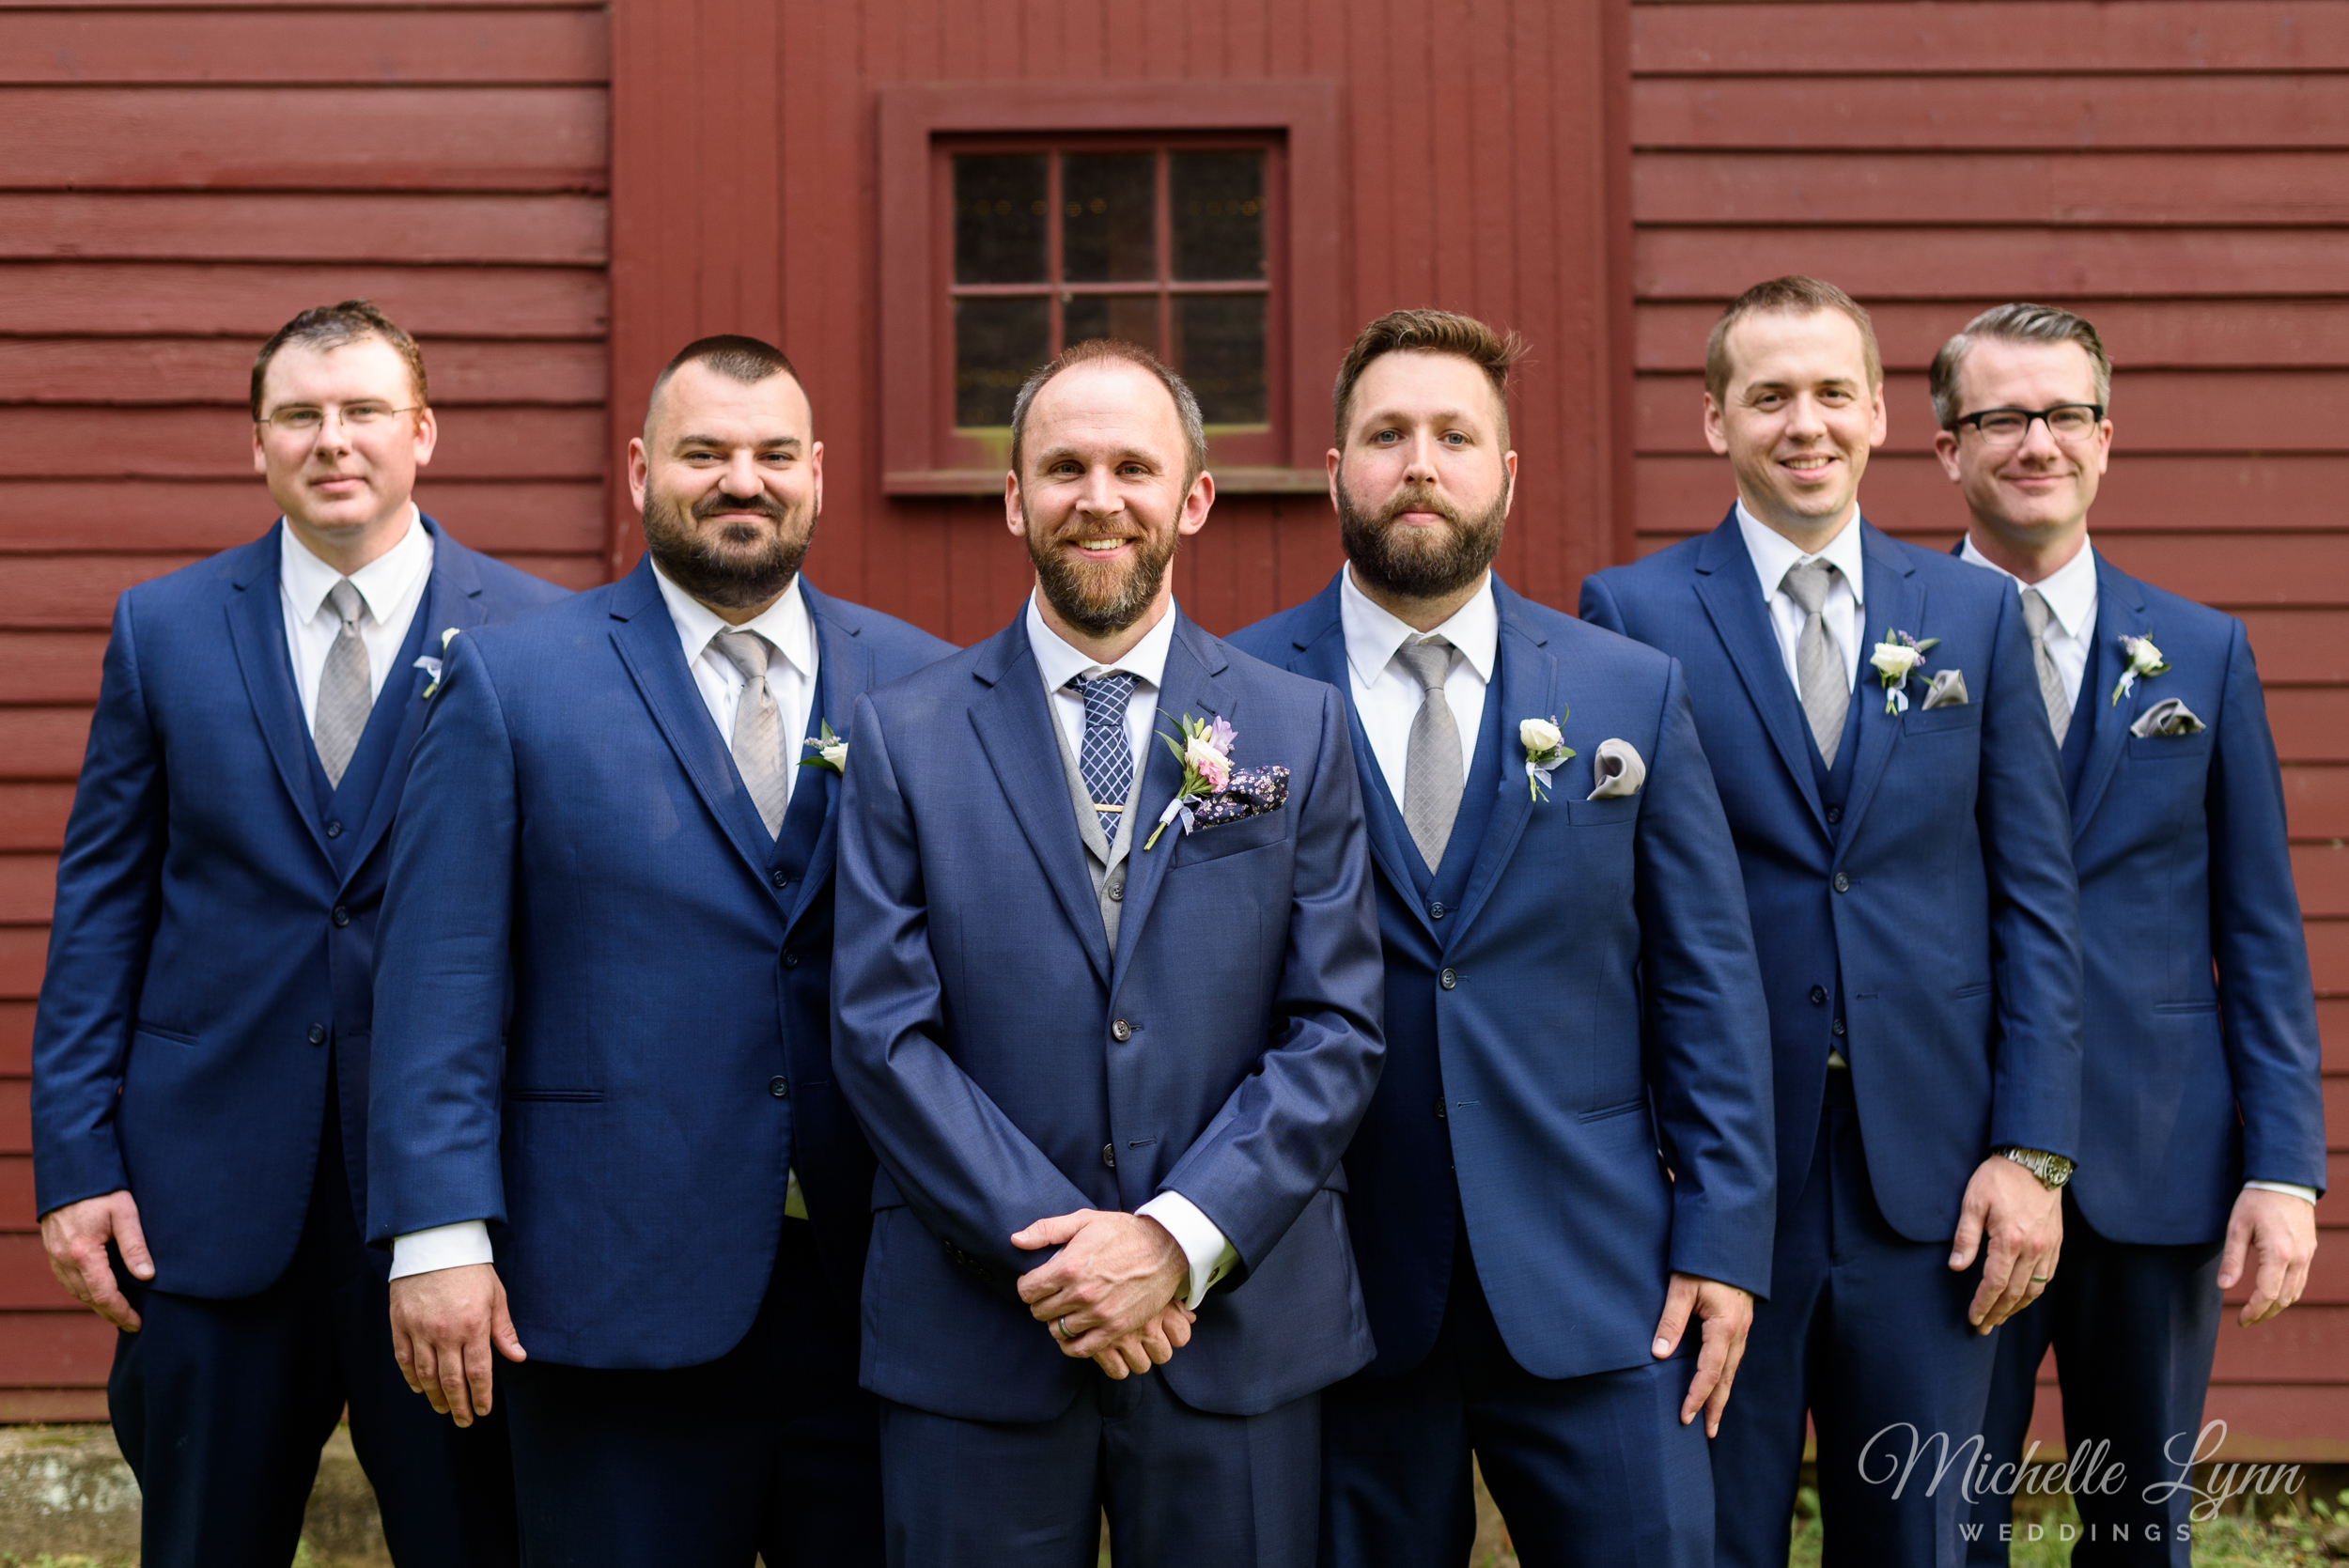 mlw-prallsville-mills-nj-wedding-photographer-49.jpg